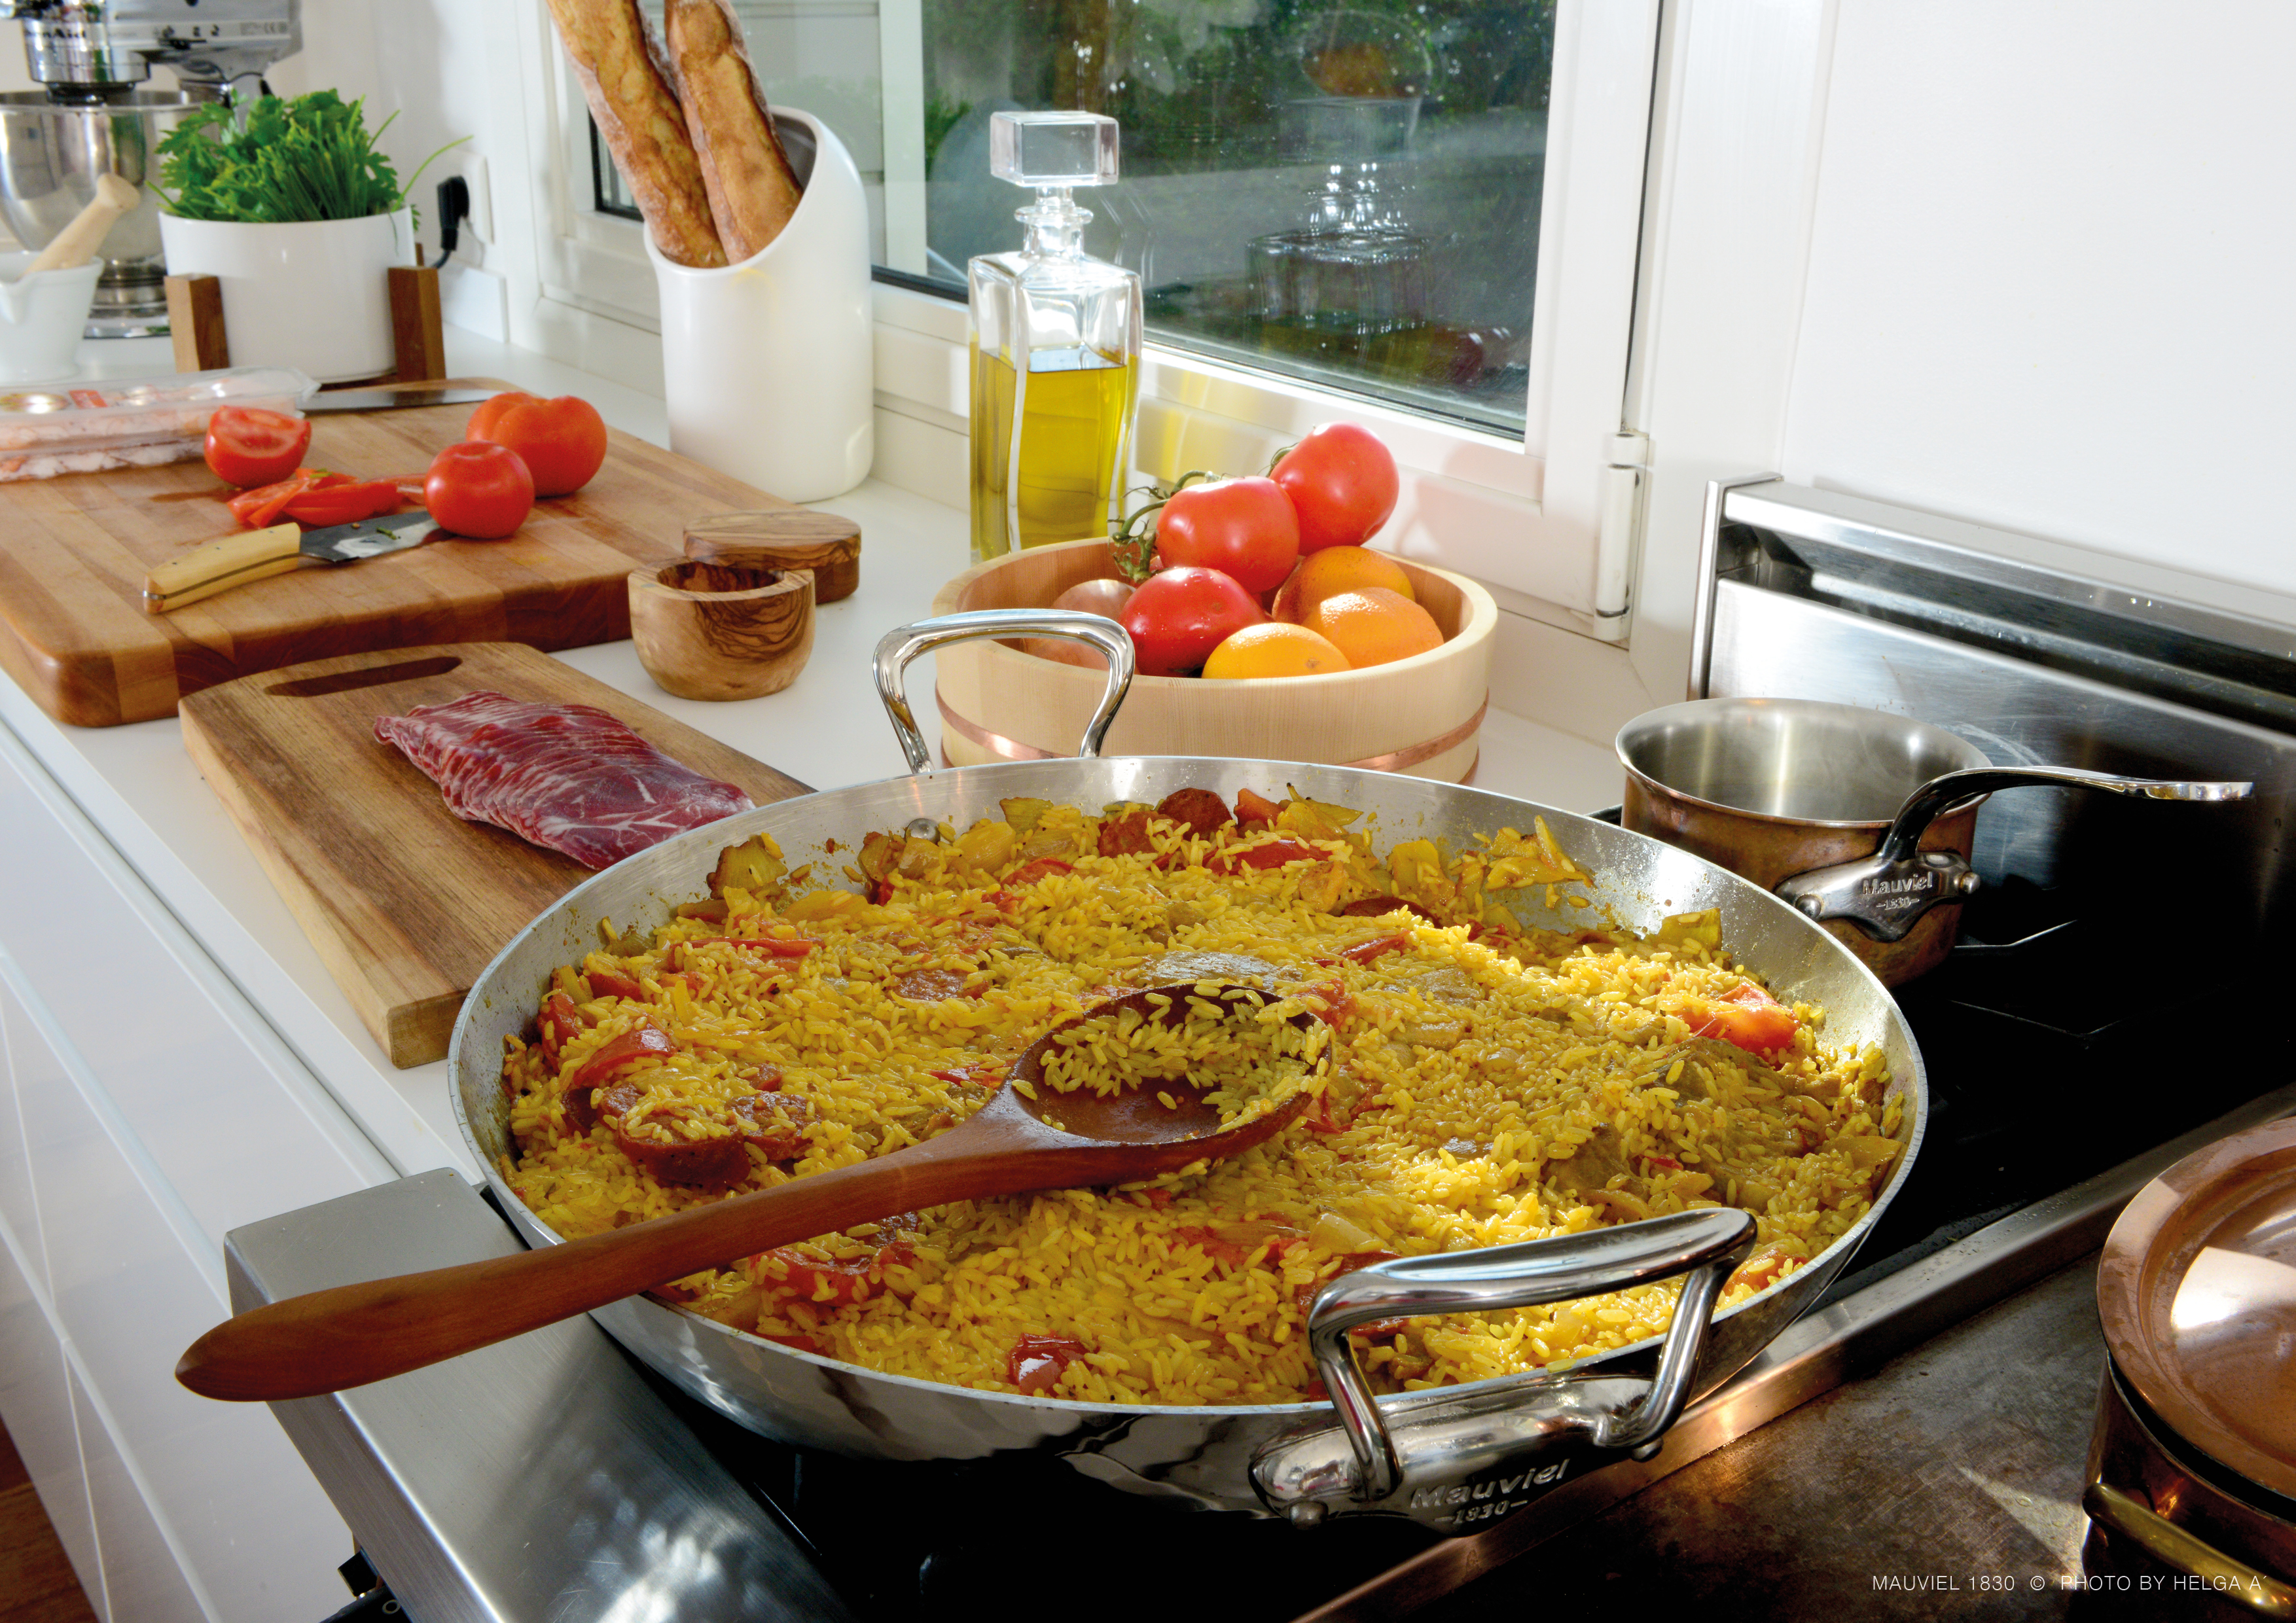 Social Media Worthy Meal Presentation Kitchenware News